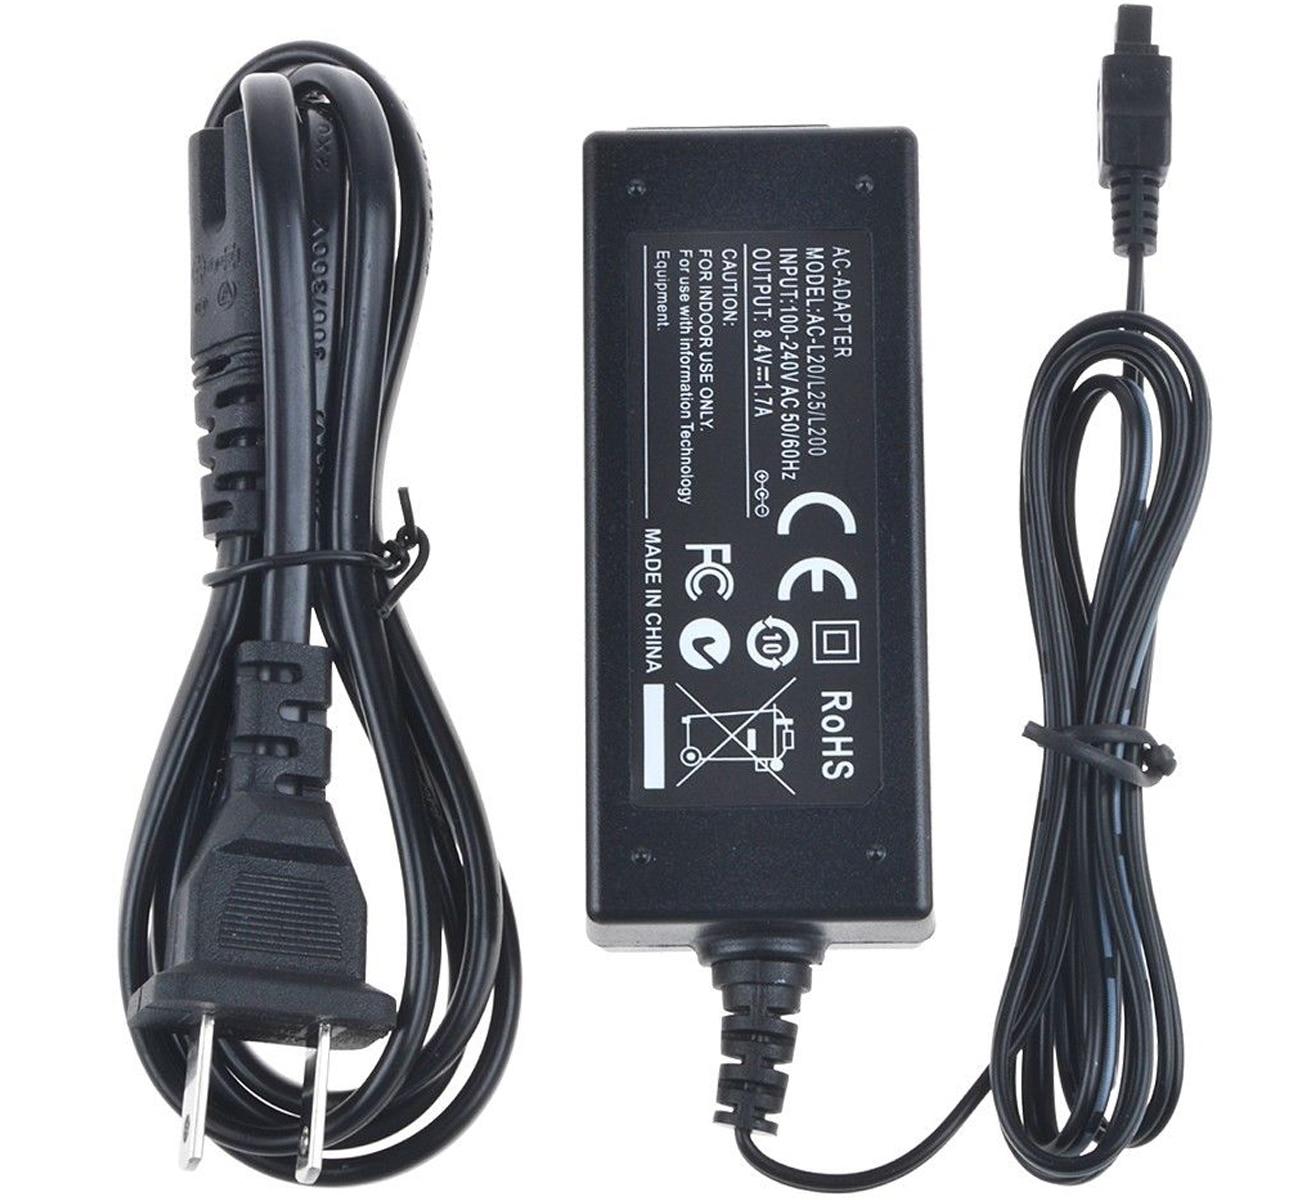 DCR-SX43 DCR-SX73 DCR-SX53 LCD USB Battery Charger for Sony DCR-SX15 DCR-SX83 Handycam Camcorder DCR-SX63 DCR-SX33